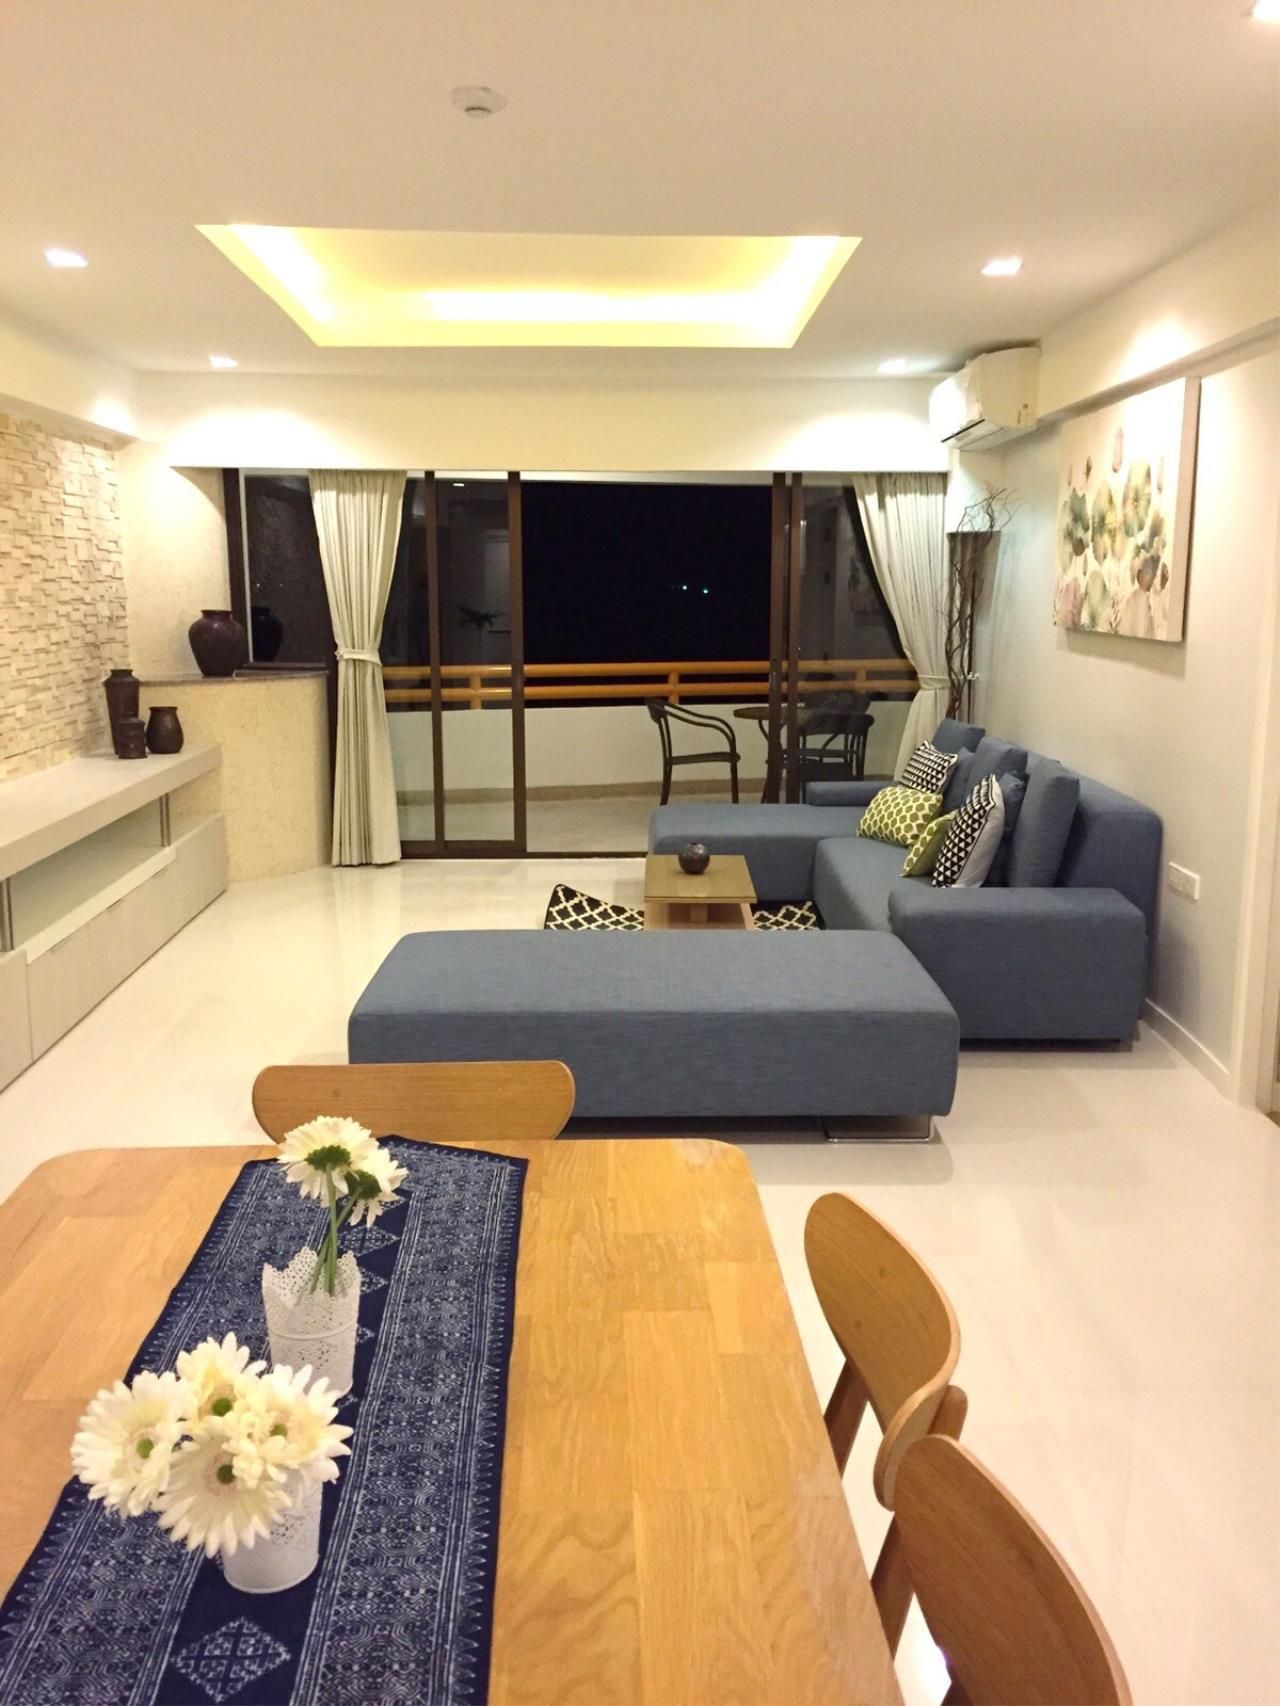 Blueocean property Agency's Condo For Rent – Sunshine Beach Condotel Pattaya 6